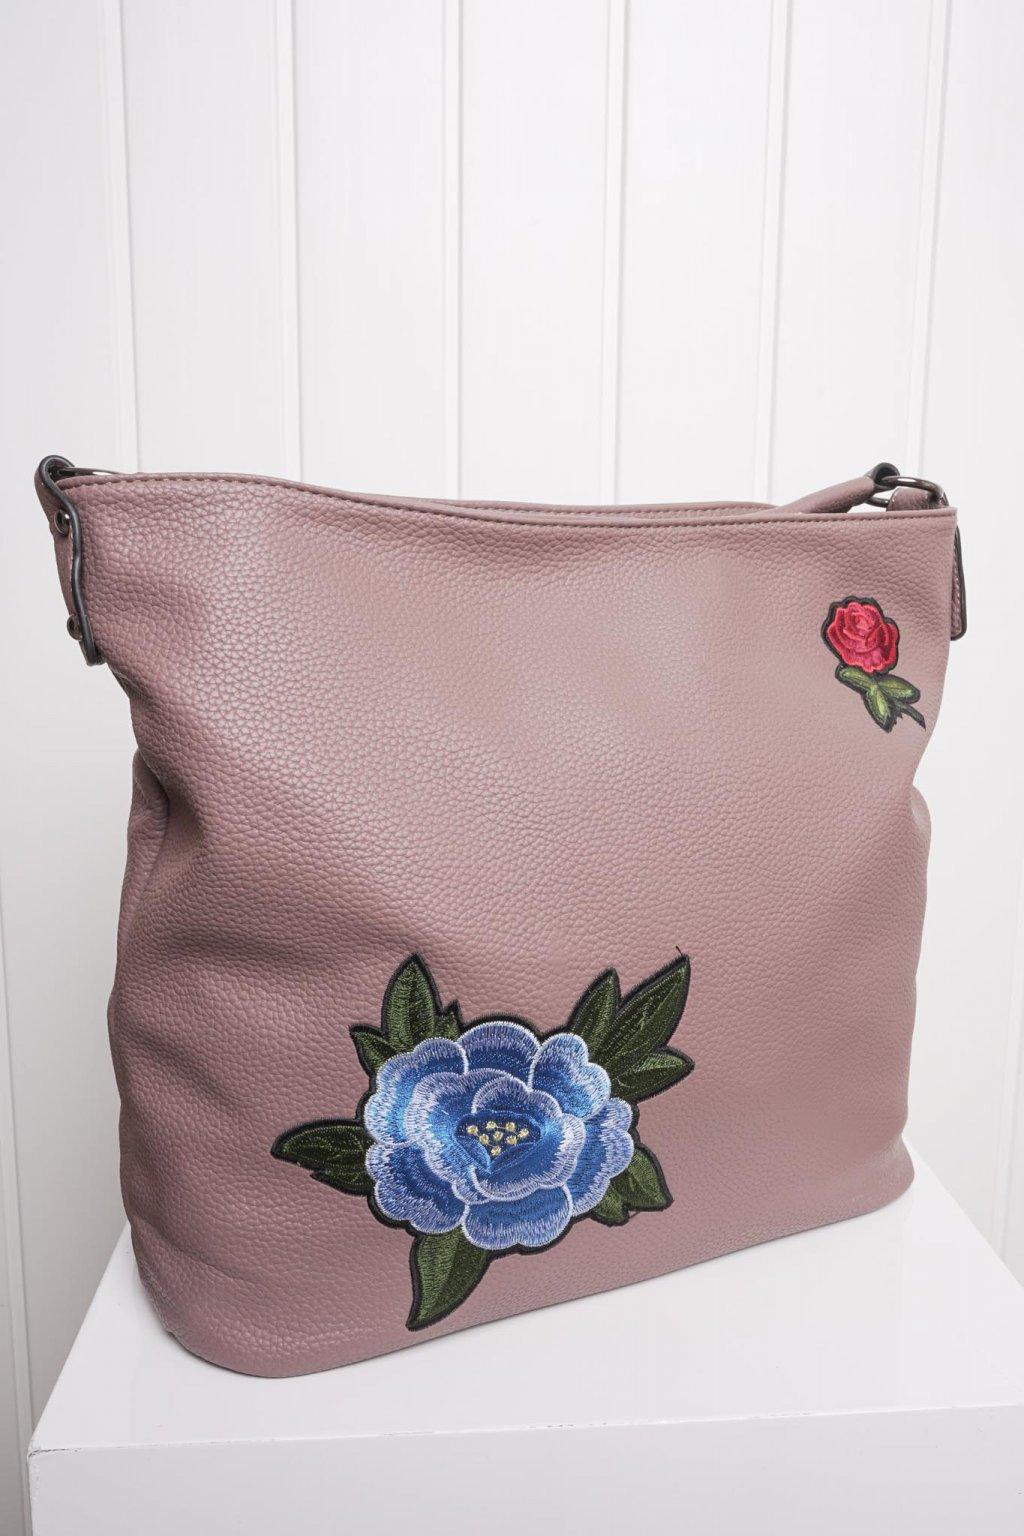 Kabelka, ruksak, dobrá cena, čierna kabelka, čierny ruksak, basic, kabelky, ruksaky 118